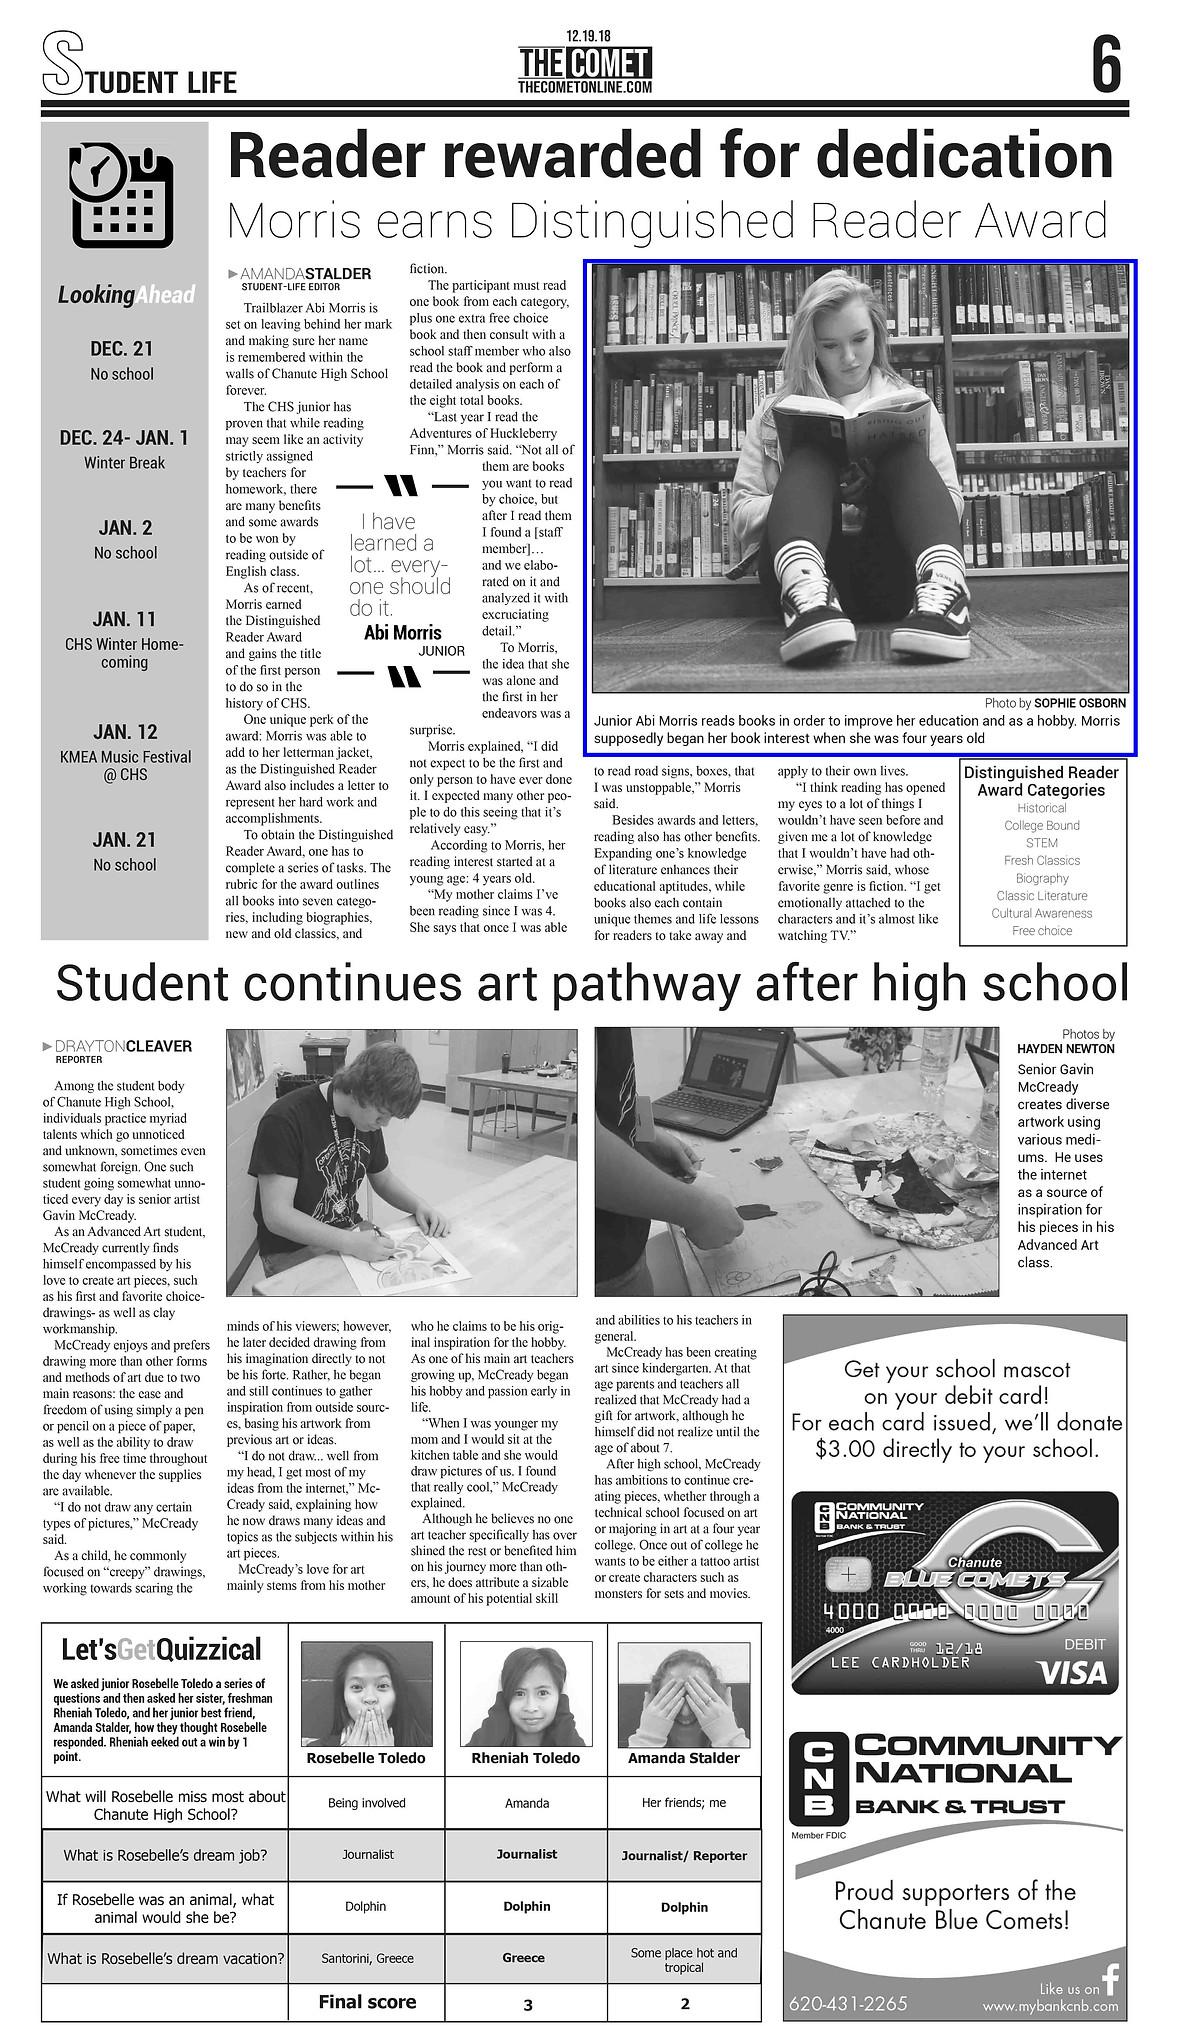 12-19-2018 Page 6-JPEG.jpg